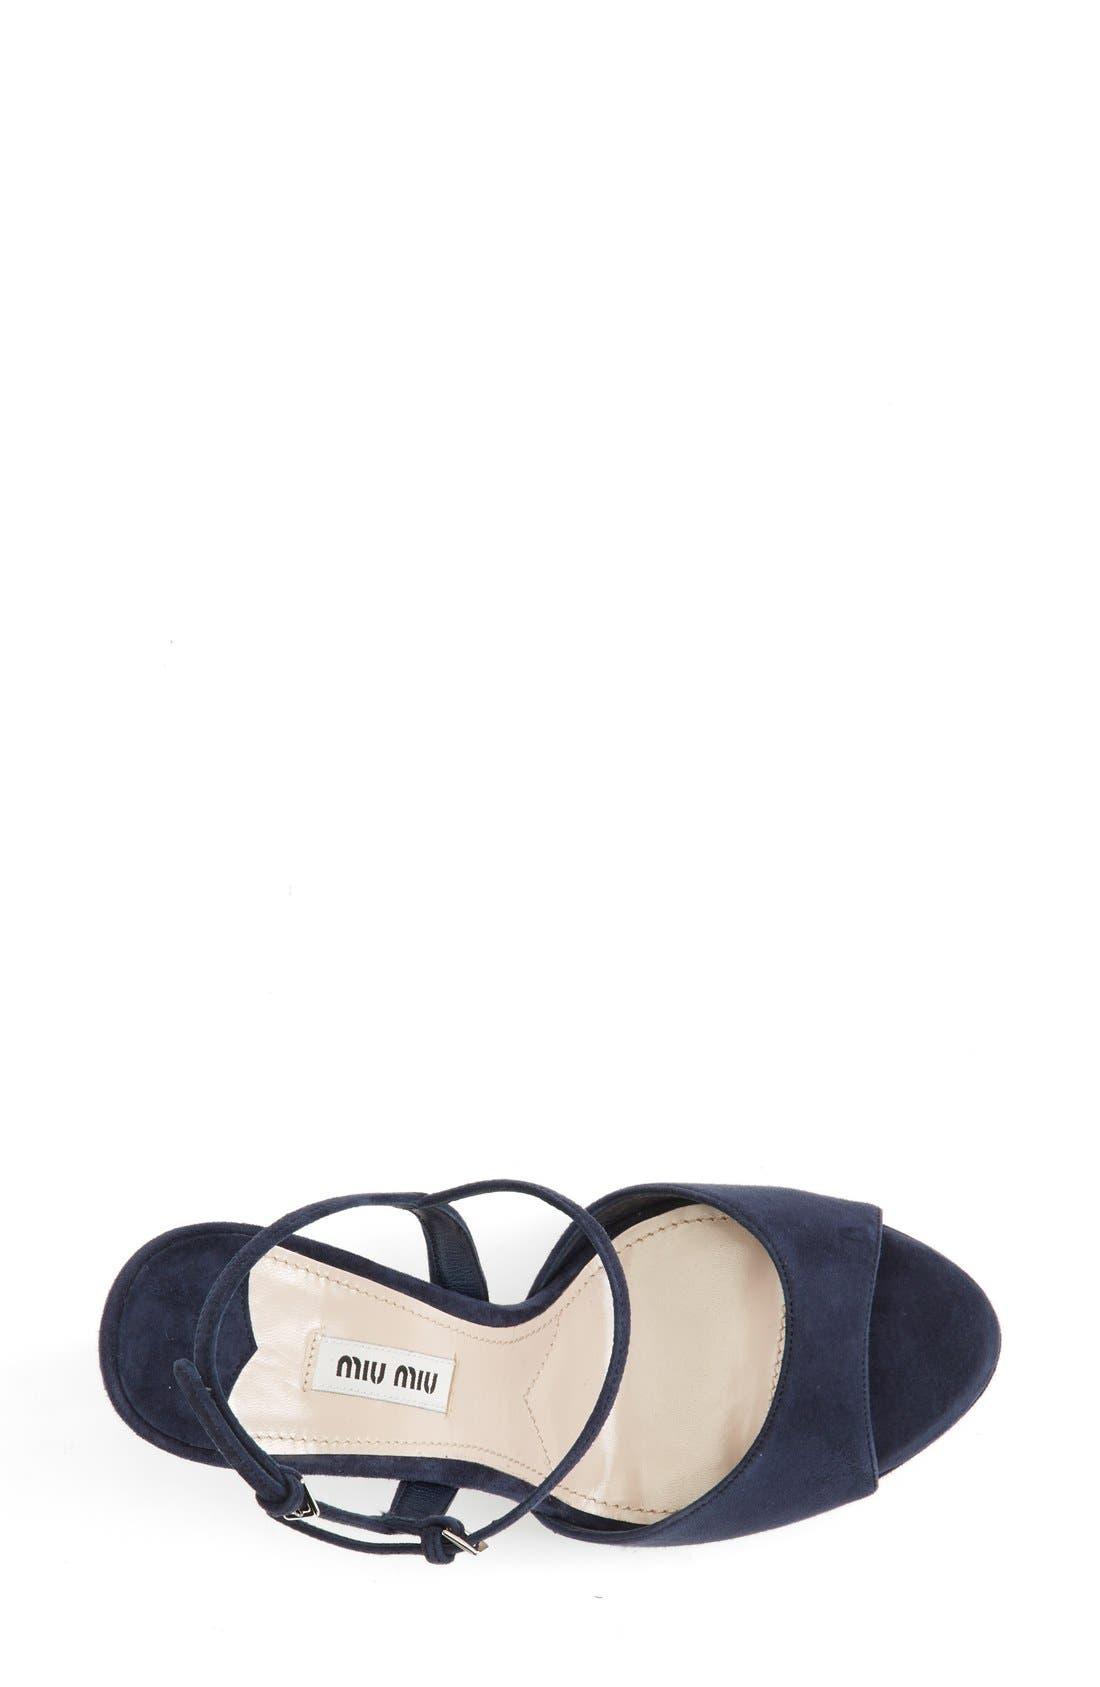 Alternate Image 3  - Miu Miu Platform Sandal (Women)